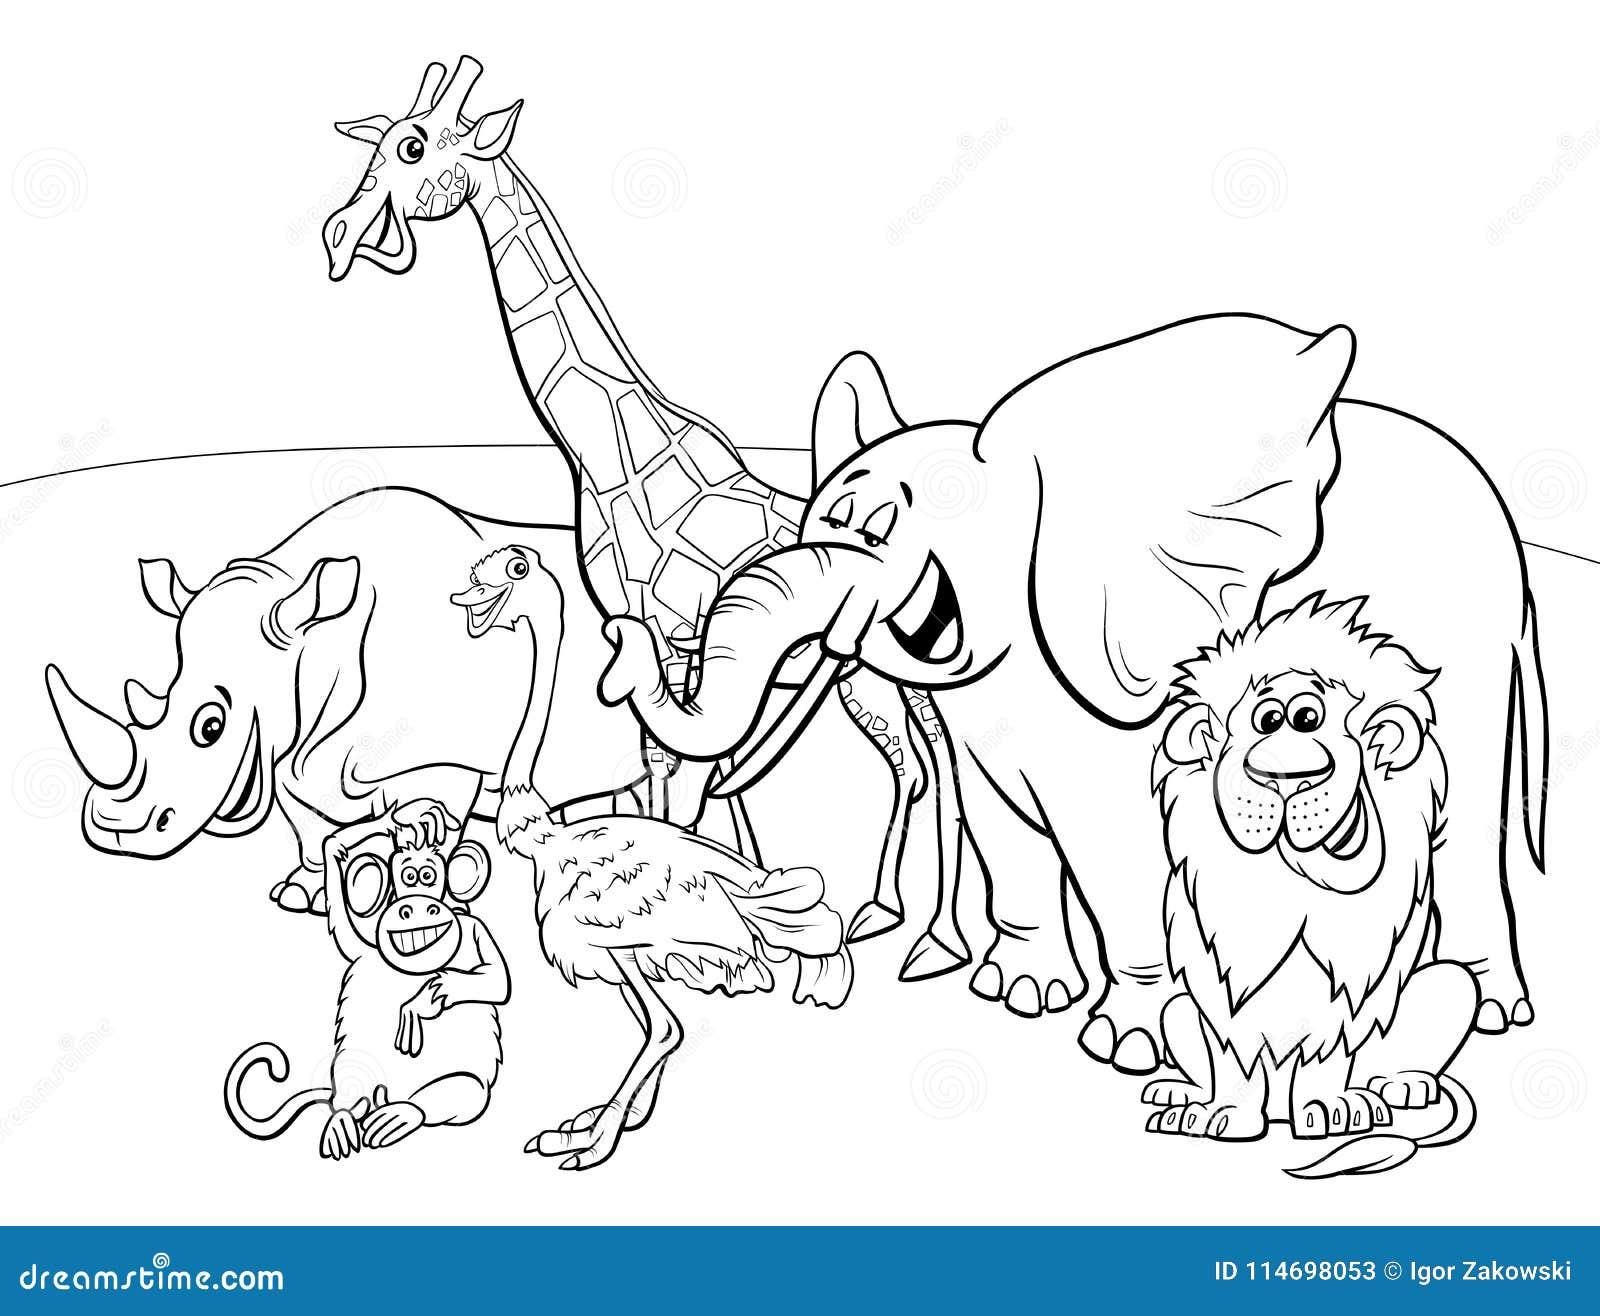 Cartoon Safari Animal Characters Coloring Book Stock Vector ...